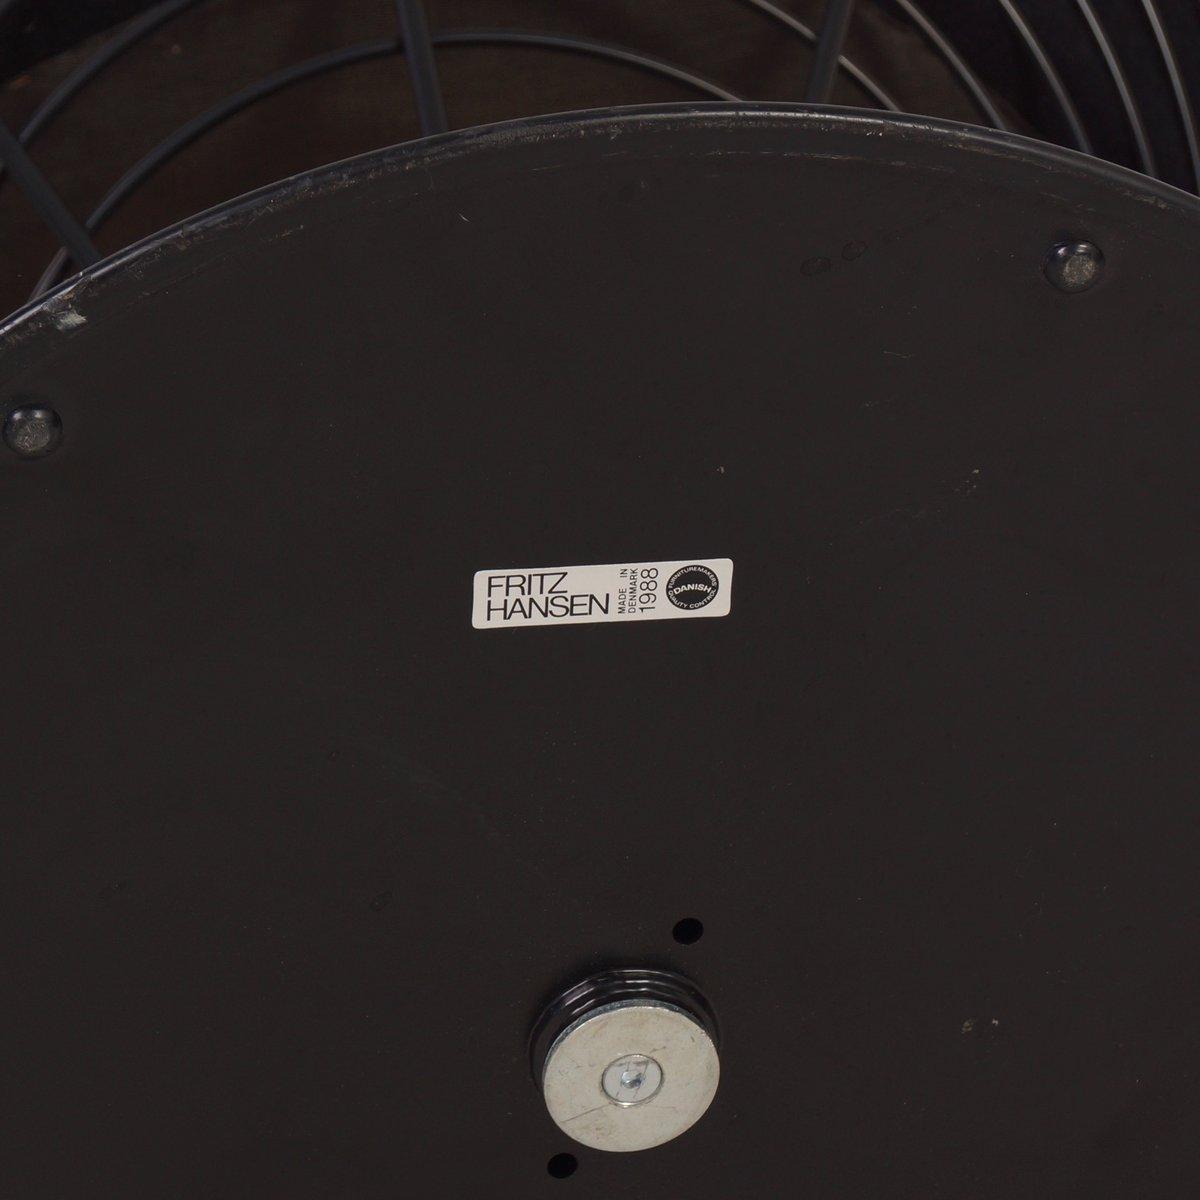 Gemütlich 6 Draht Thermostat Galerie - Verdrahtungsideen - korsmi.info